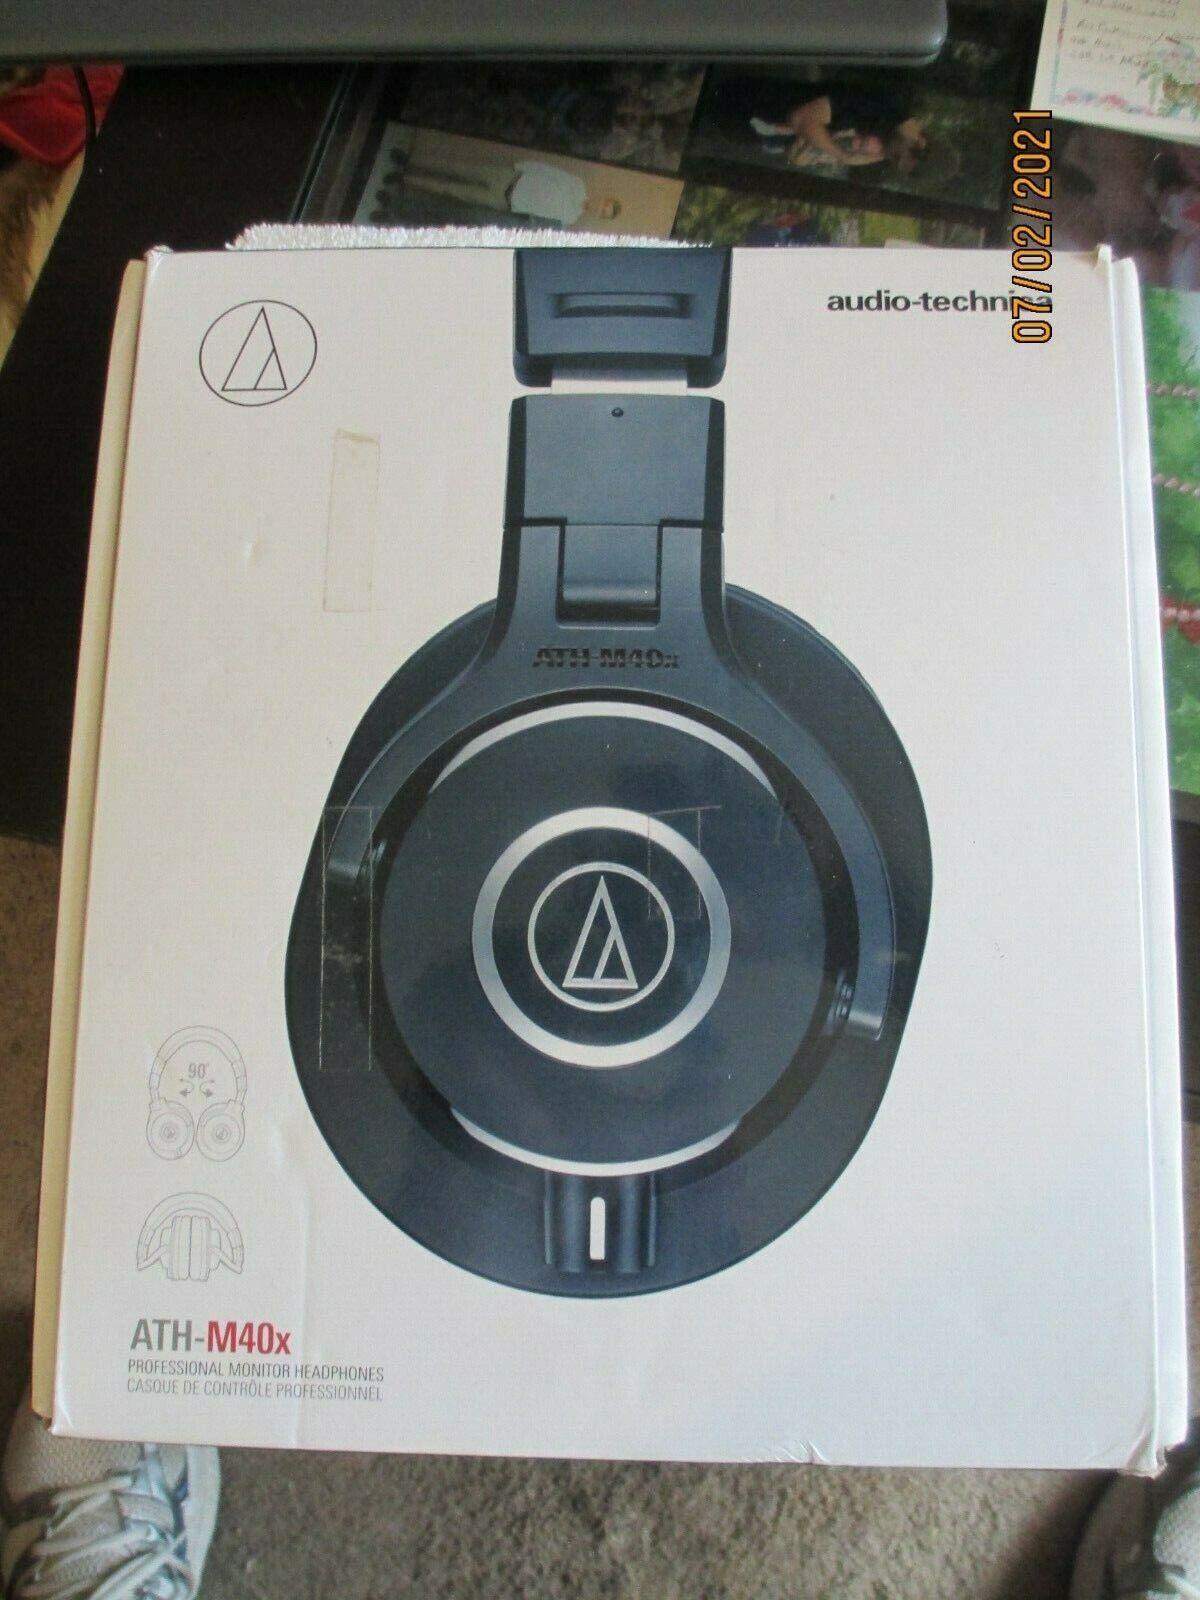 Audio-Technica ATH-M40x Over-Ear Headphones - Black